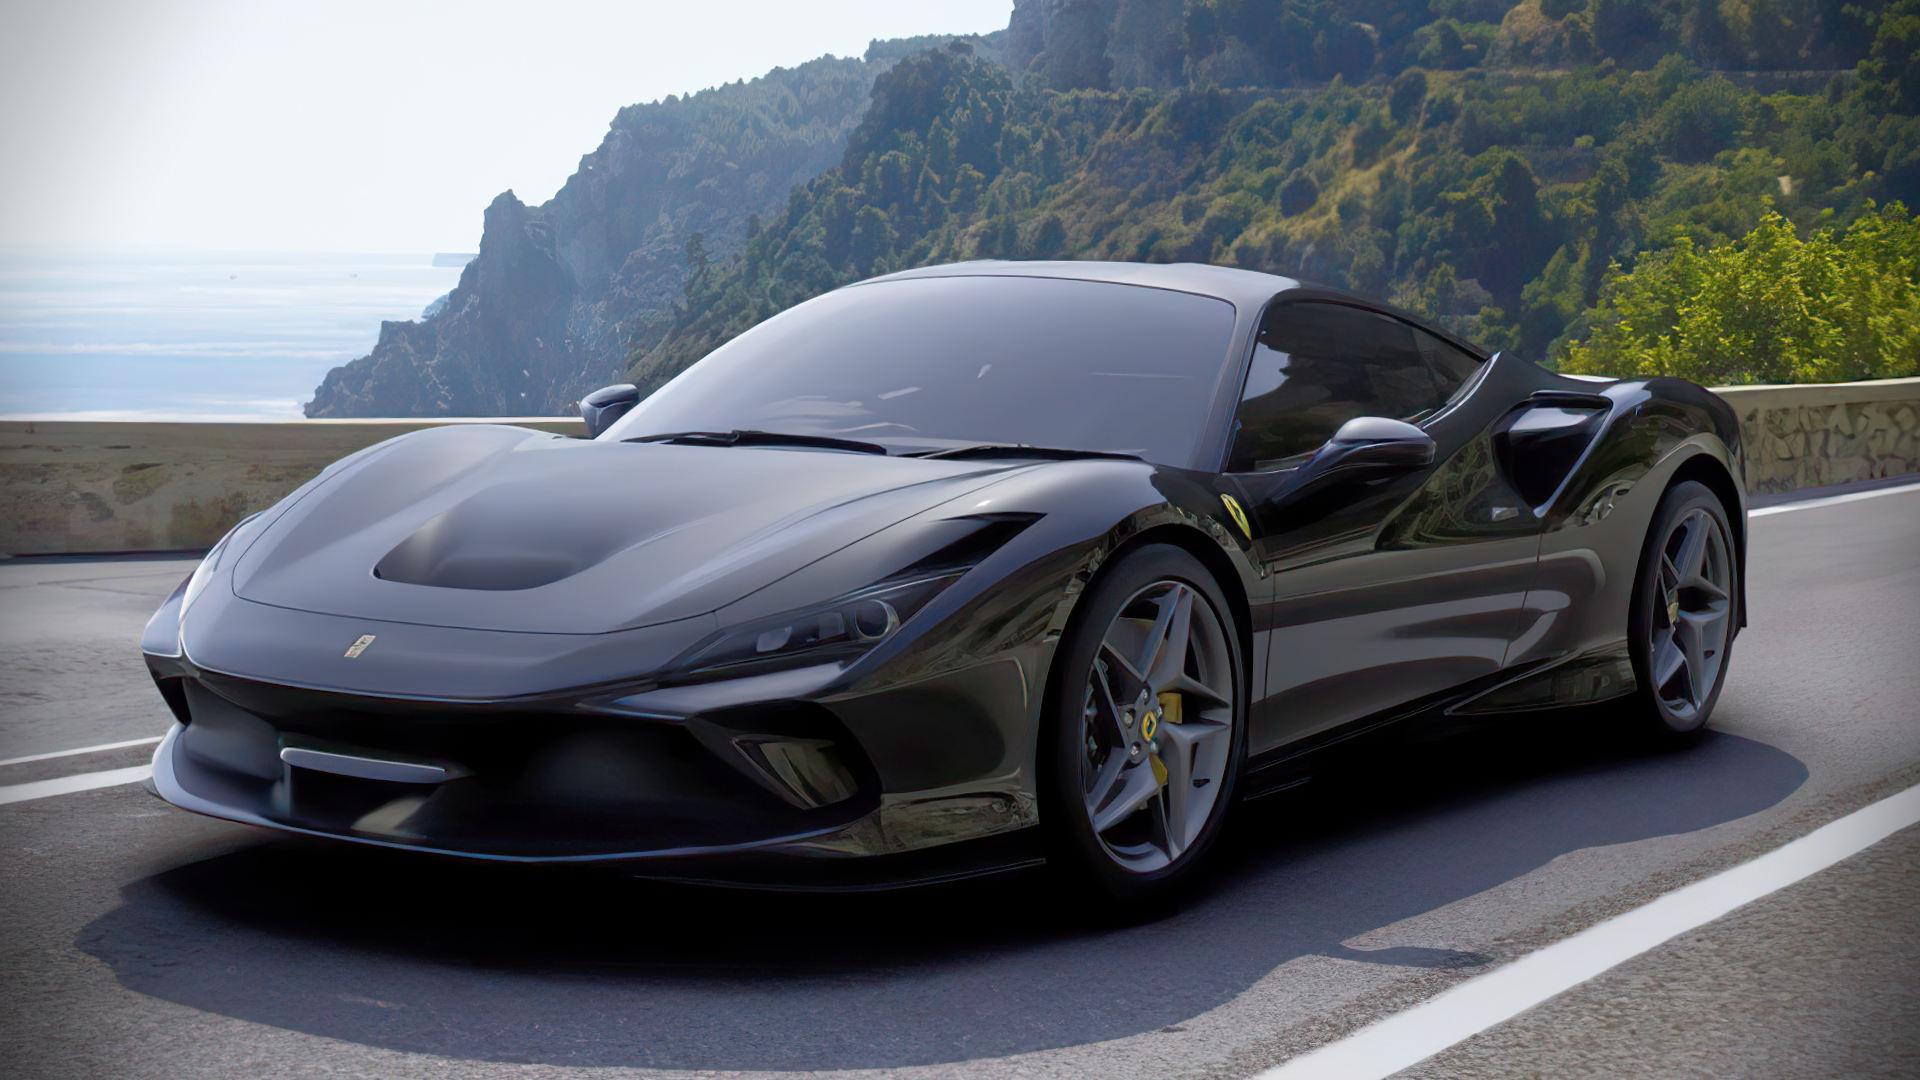 2020 Ferrari F8 Tributo Black Wallpaper